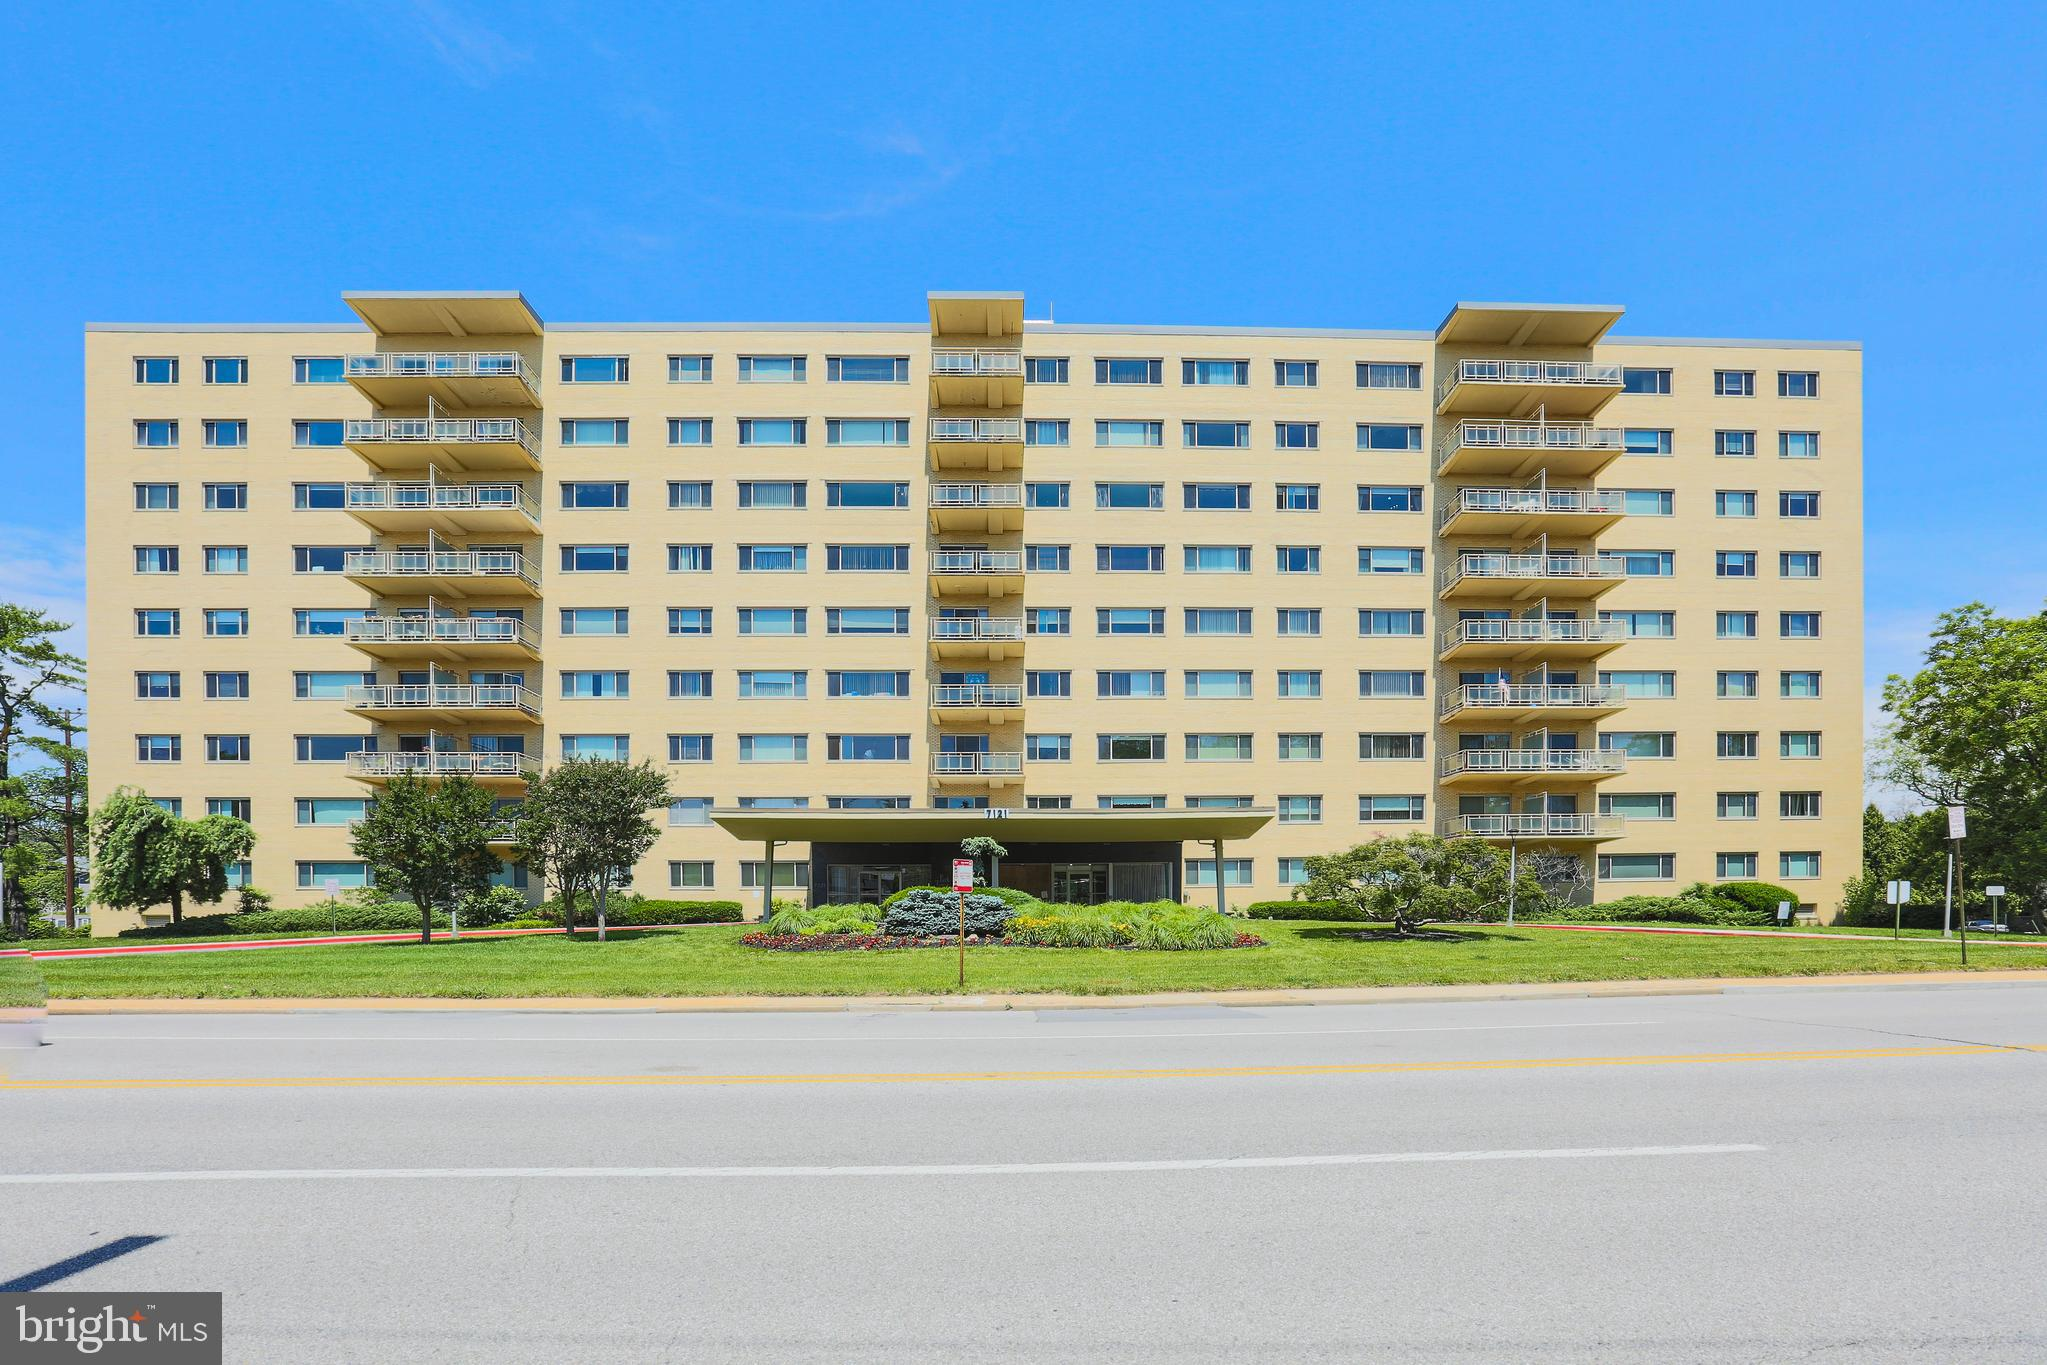 7121 PARK HEIGHTS AVENUE, BALTIMORE, Maryland 21215, 2 Bedrooms Bedrooms, ,2 BathroomsBathrooms,Condominium,For Sale,7121 PARK HEIGHTS AVENUE,MDBA518670